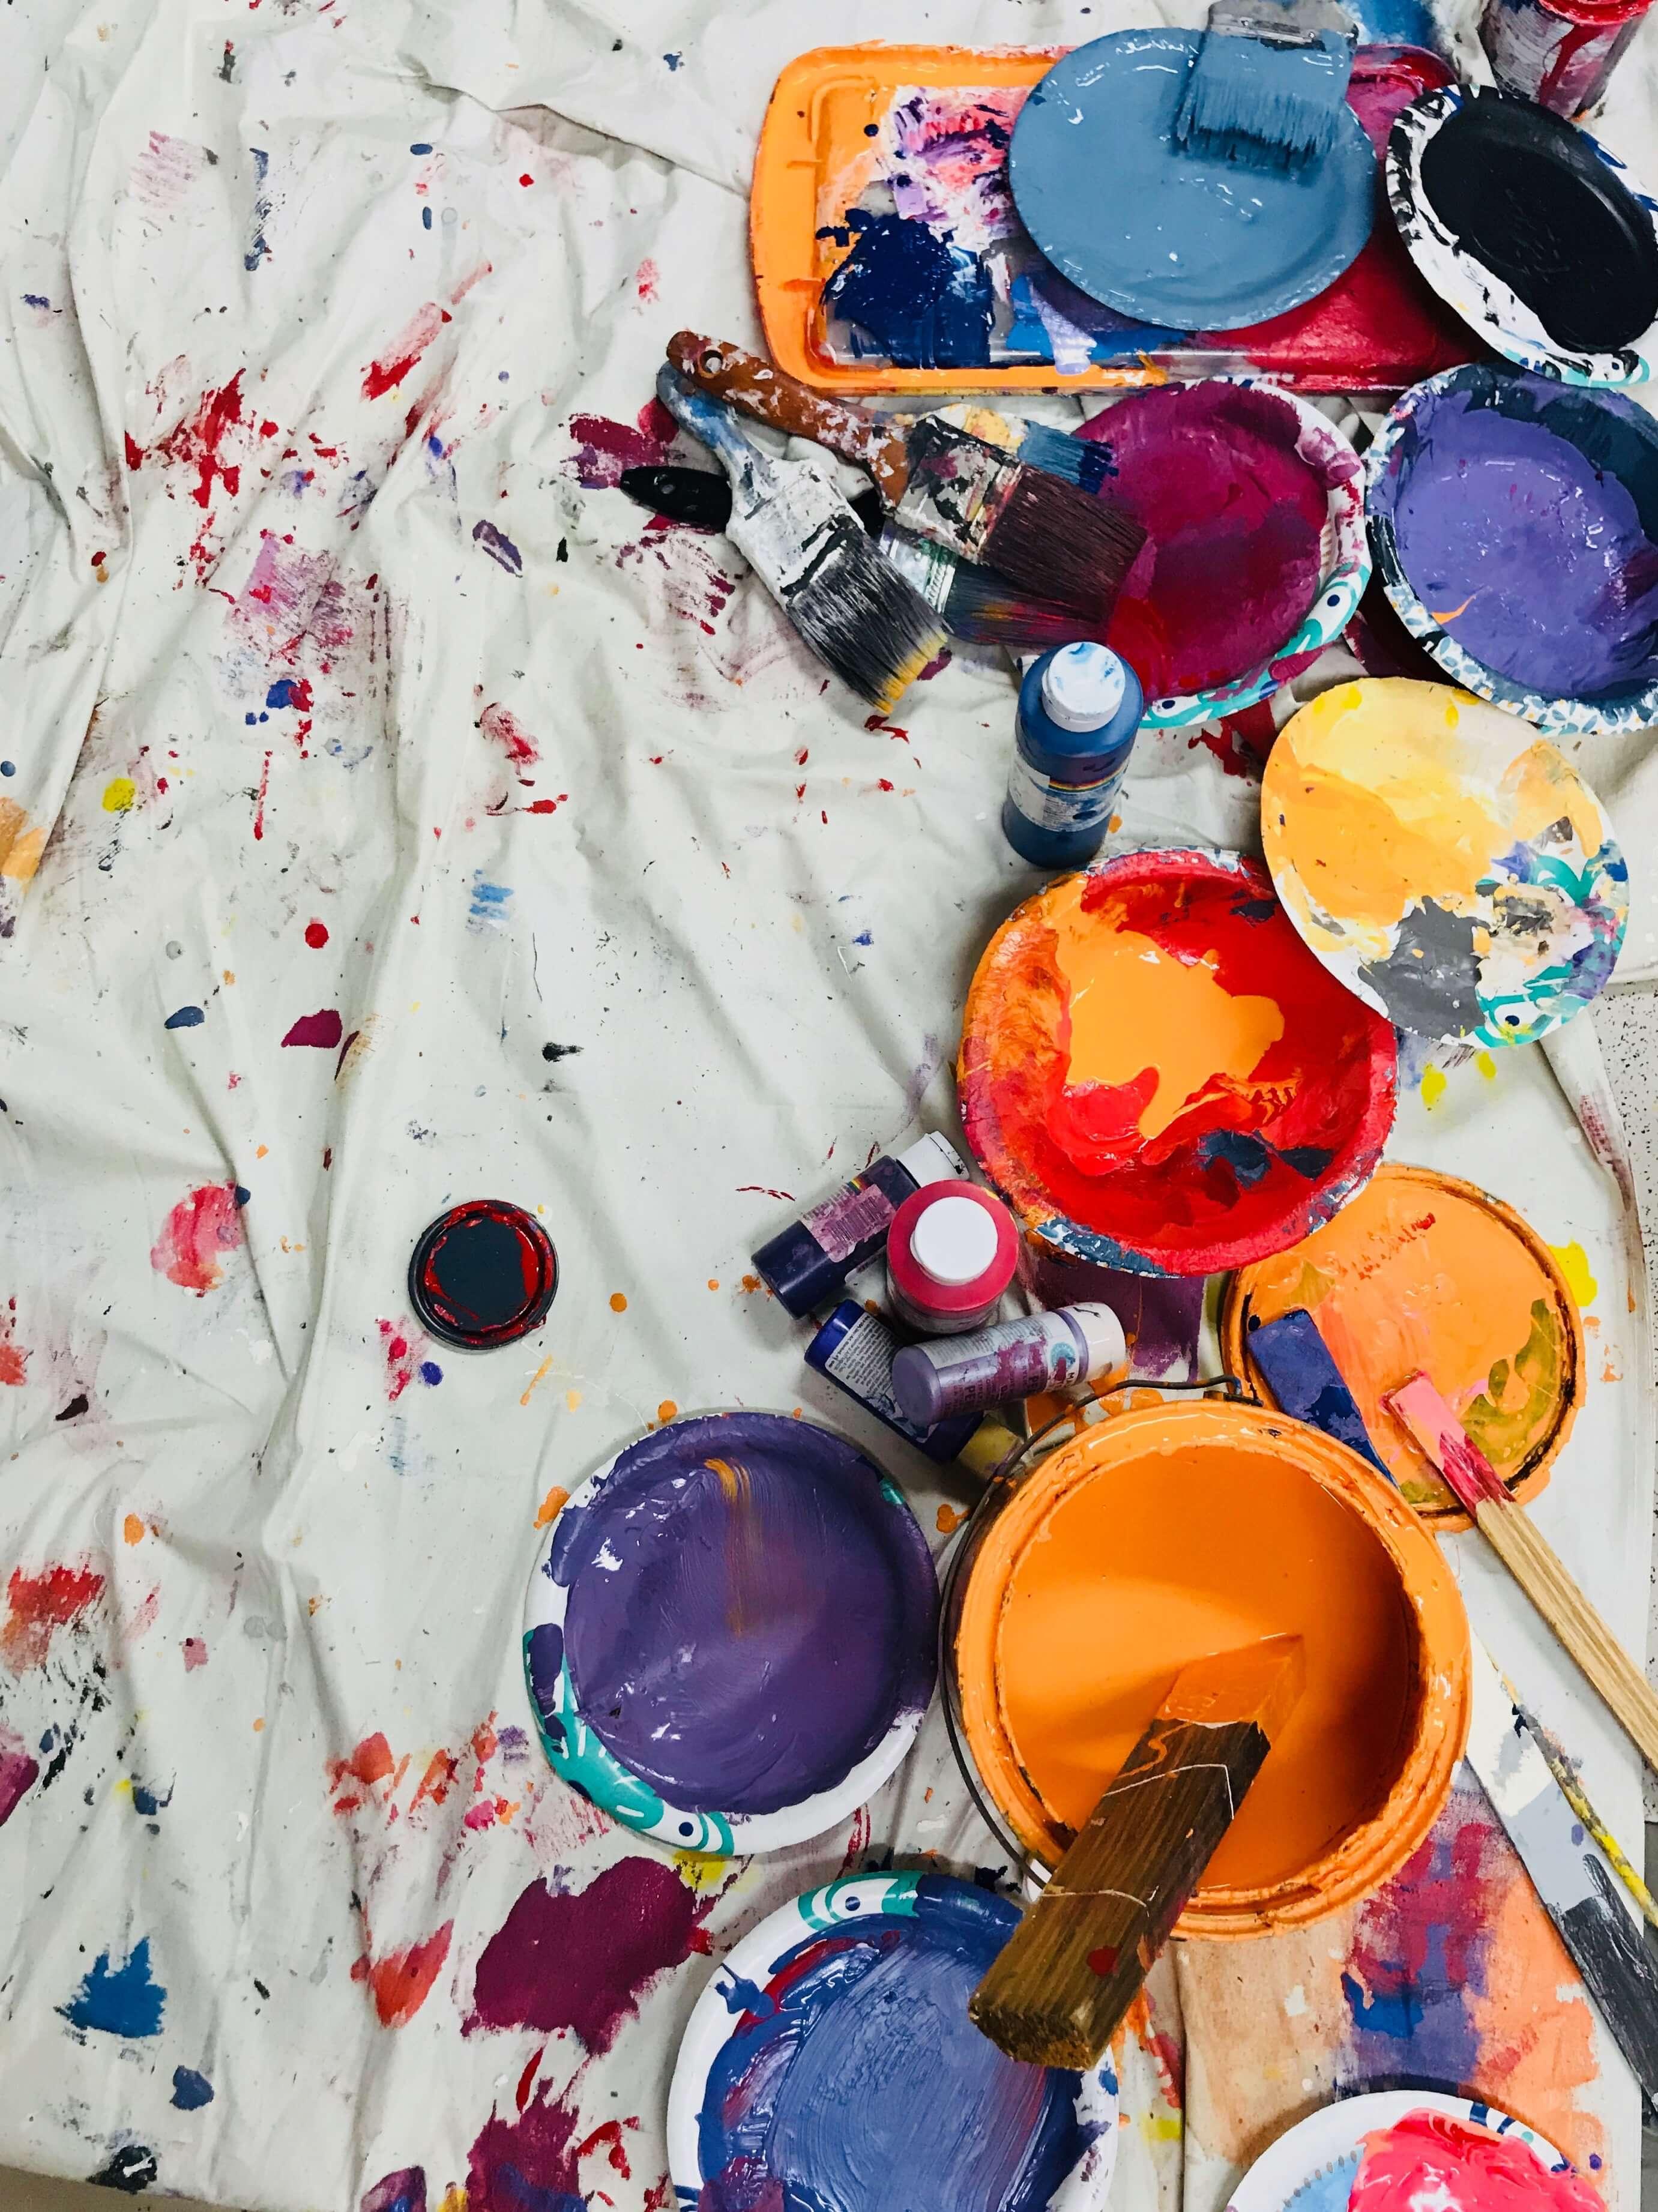 paintsplat-creative